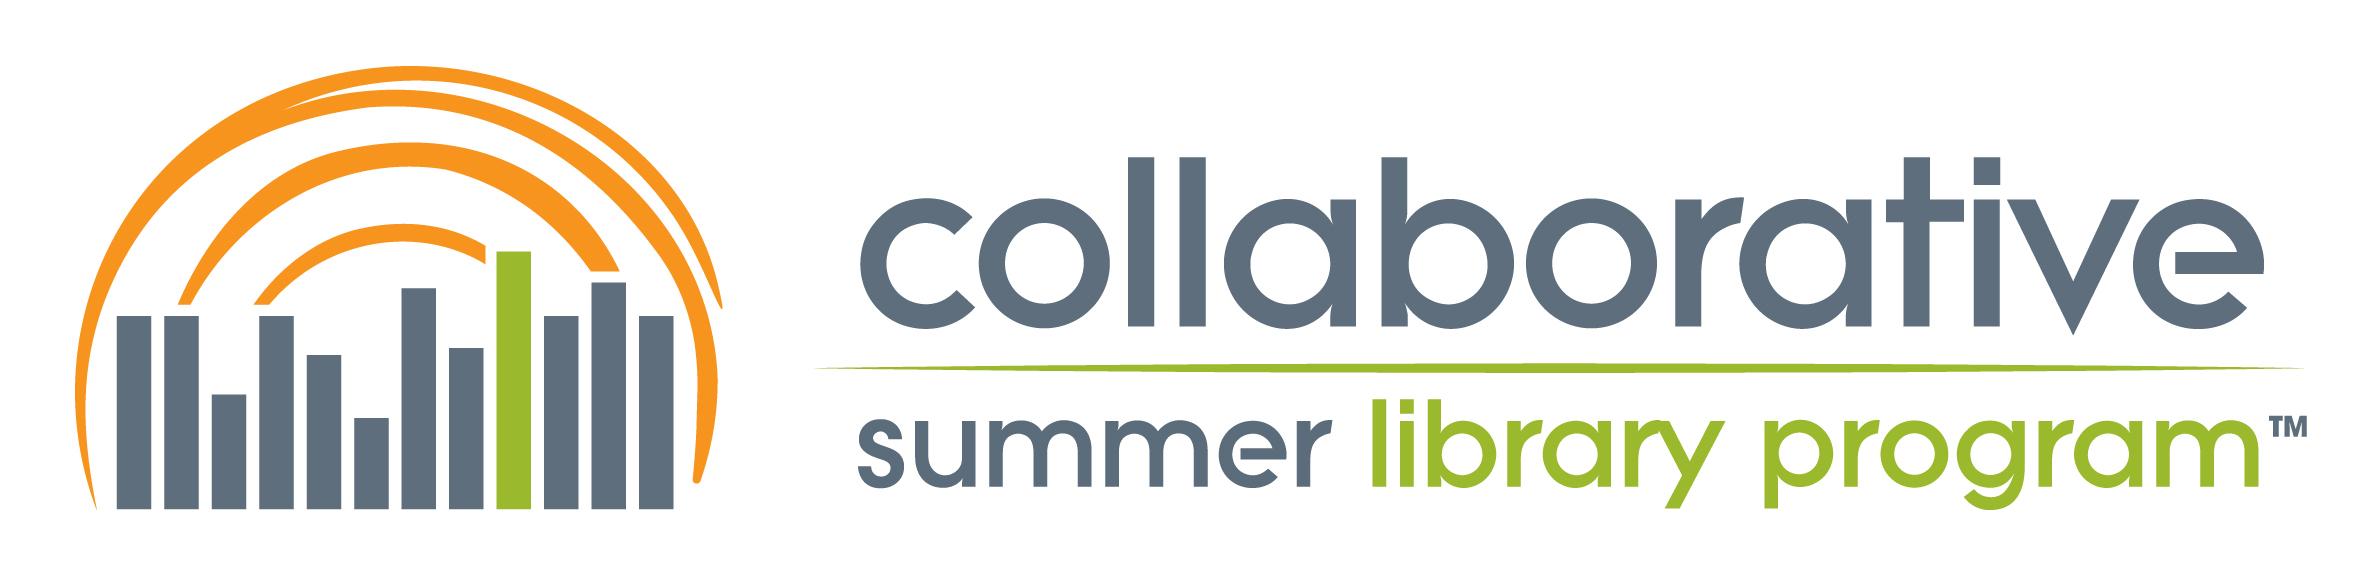 Collaborative Summer Library Program Store